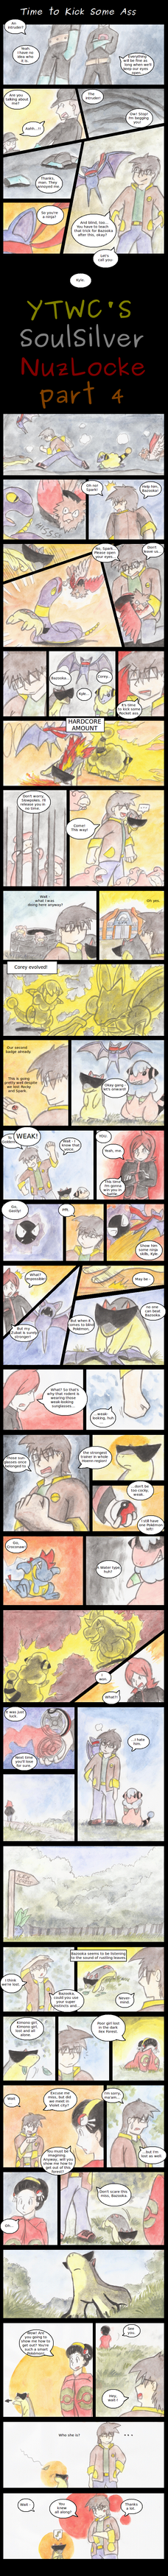 YTWC's Nuzlocke 4 by Yamashita-akaDoragon